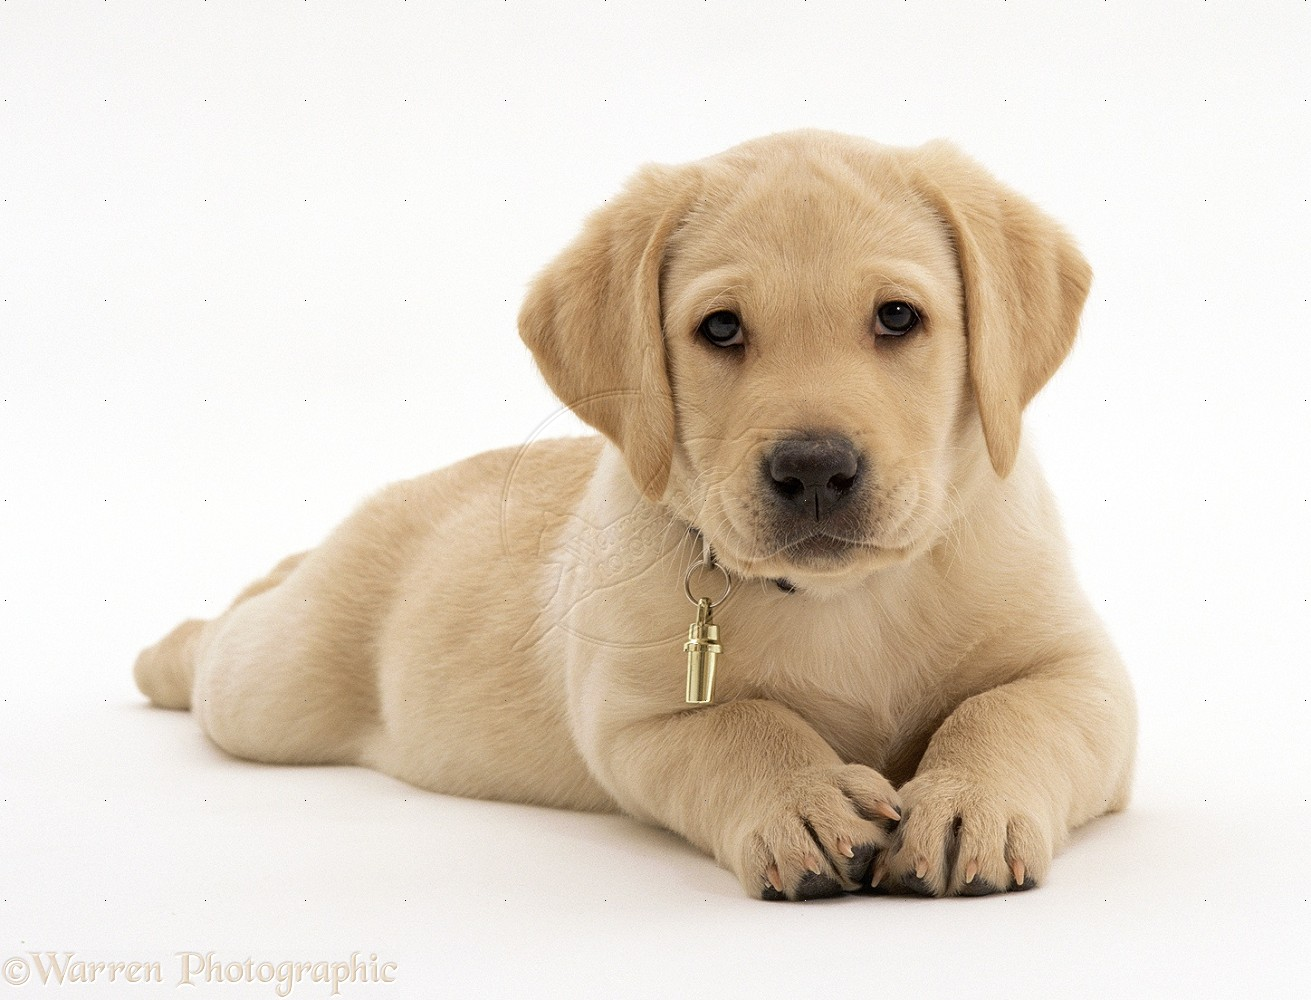 Yellow Labrador Retriever Puppy White Background   1311x1000 iWallHD 1311x1000